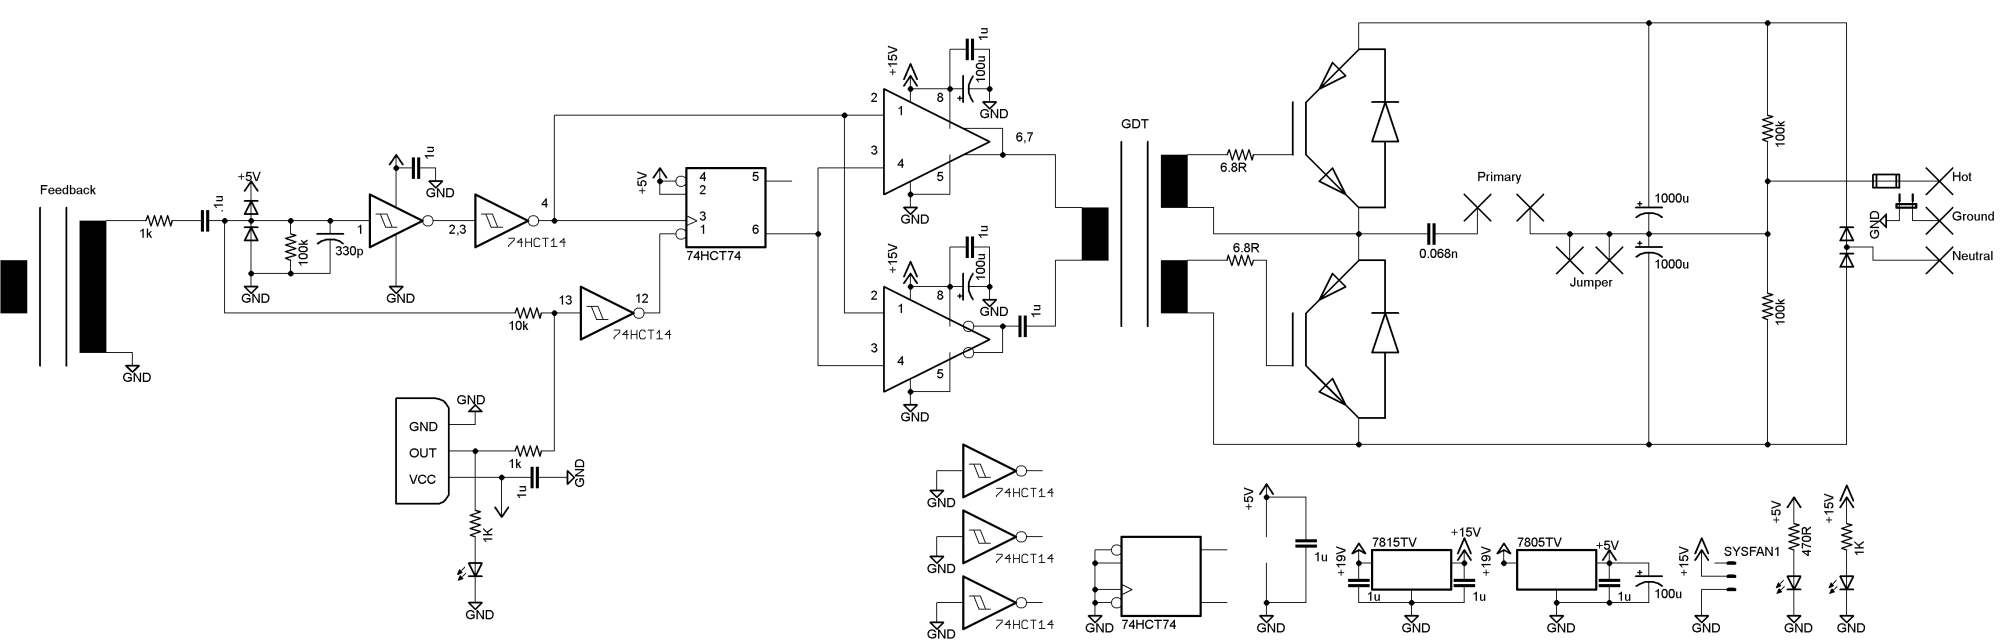 hight resolution of onetesla schematic 110v version tesla coil plans